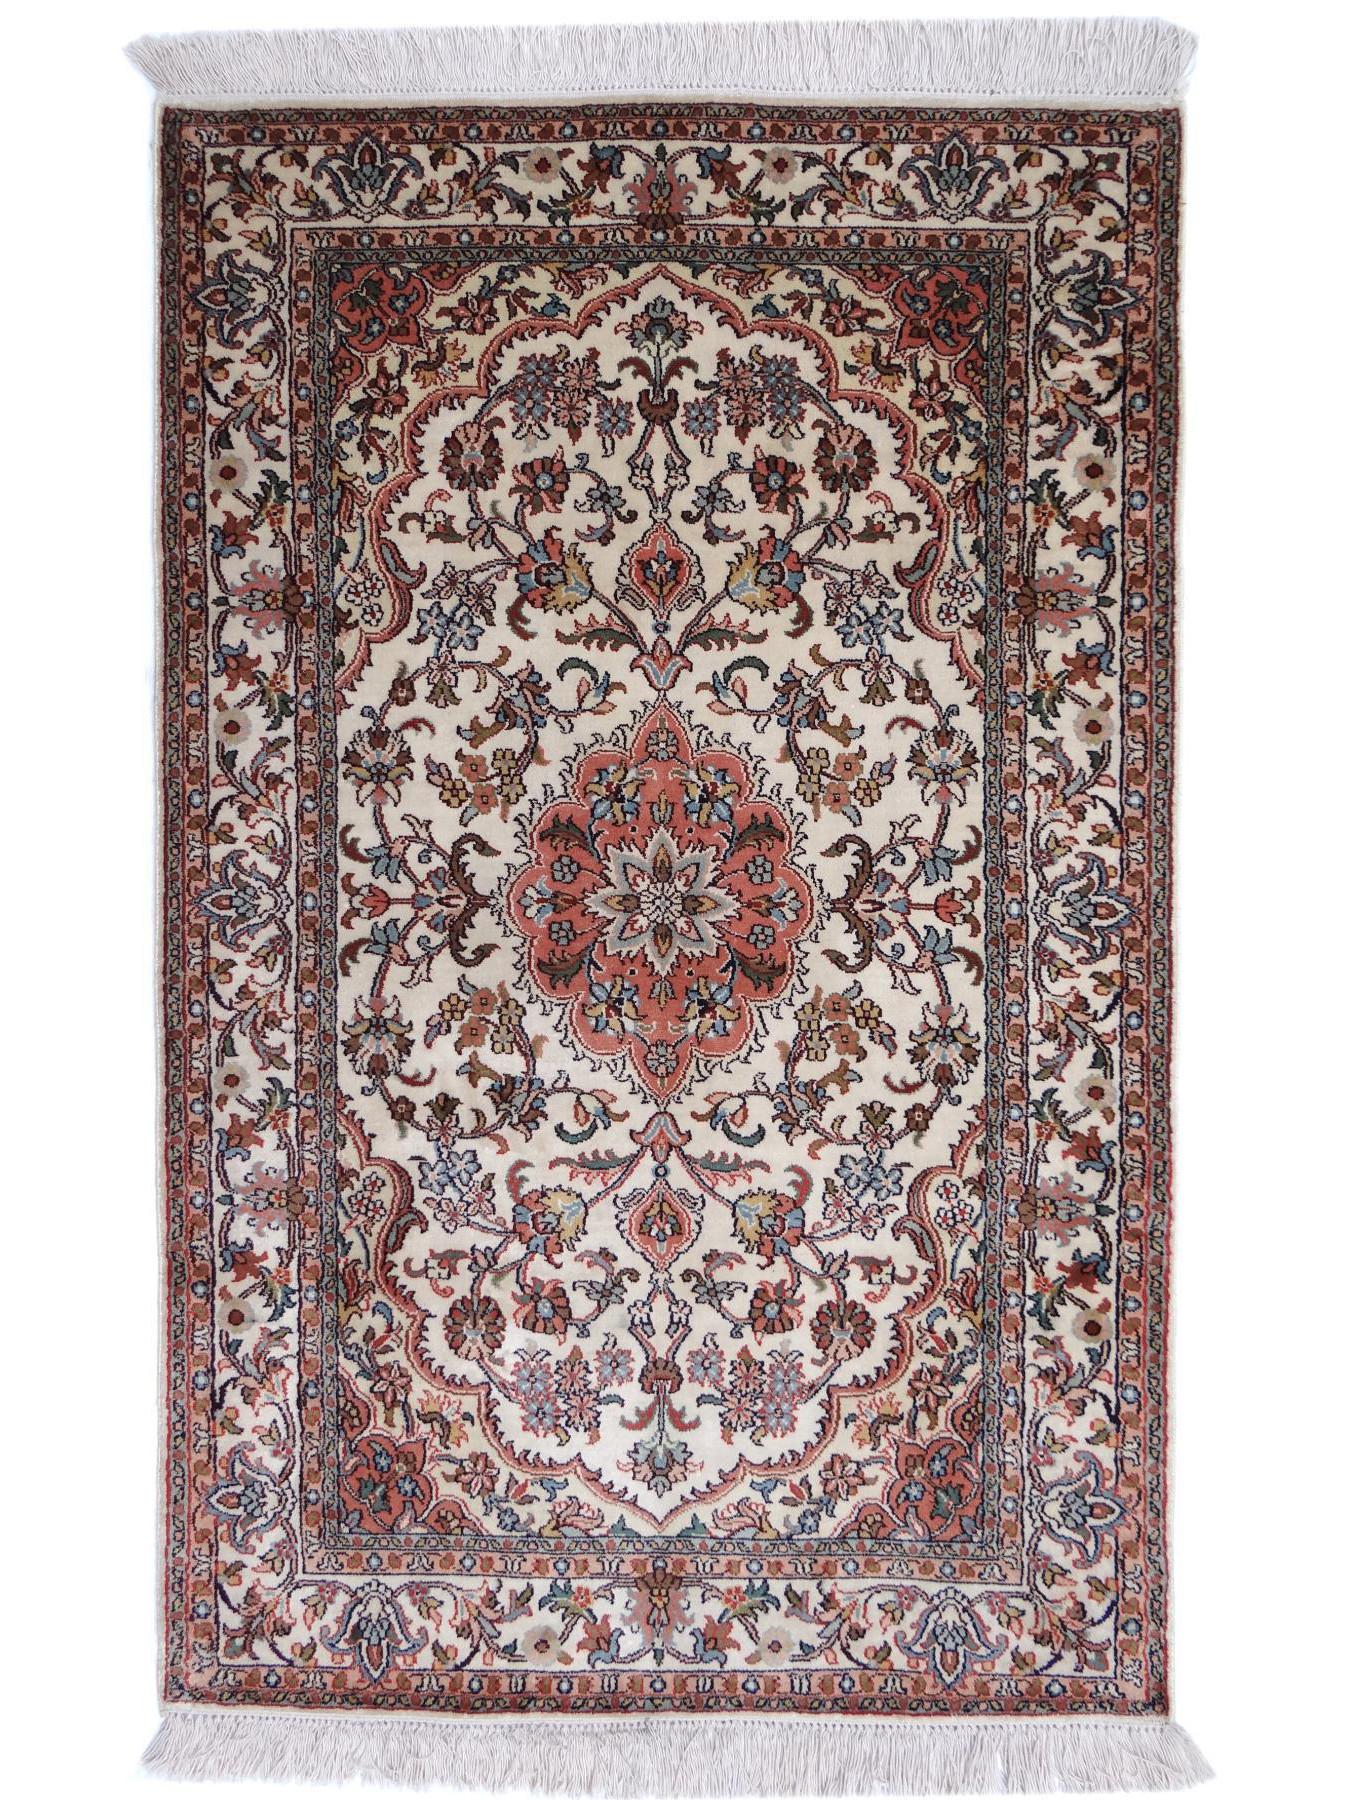 Srinagar Soie Fin Tapis Prestigieux N 2307 122x78cm